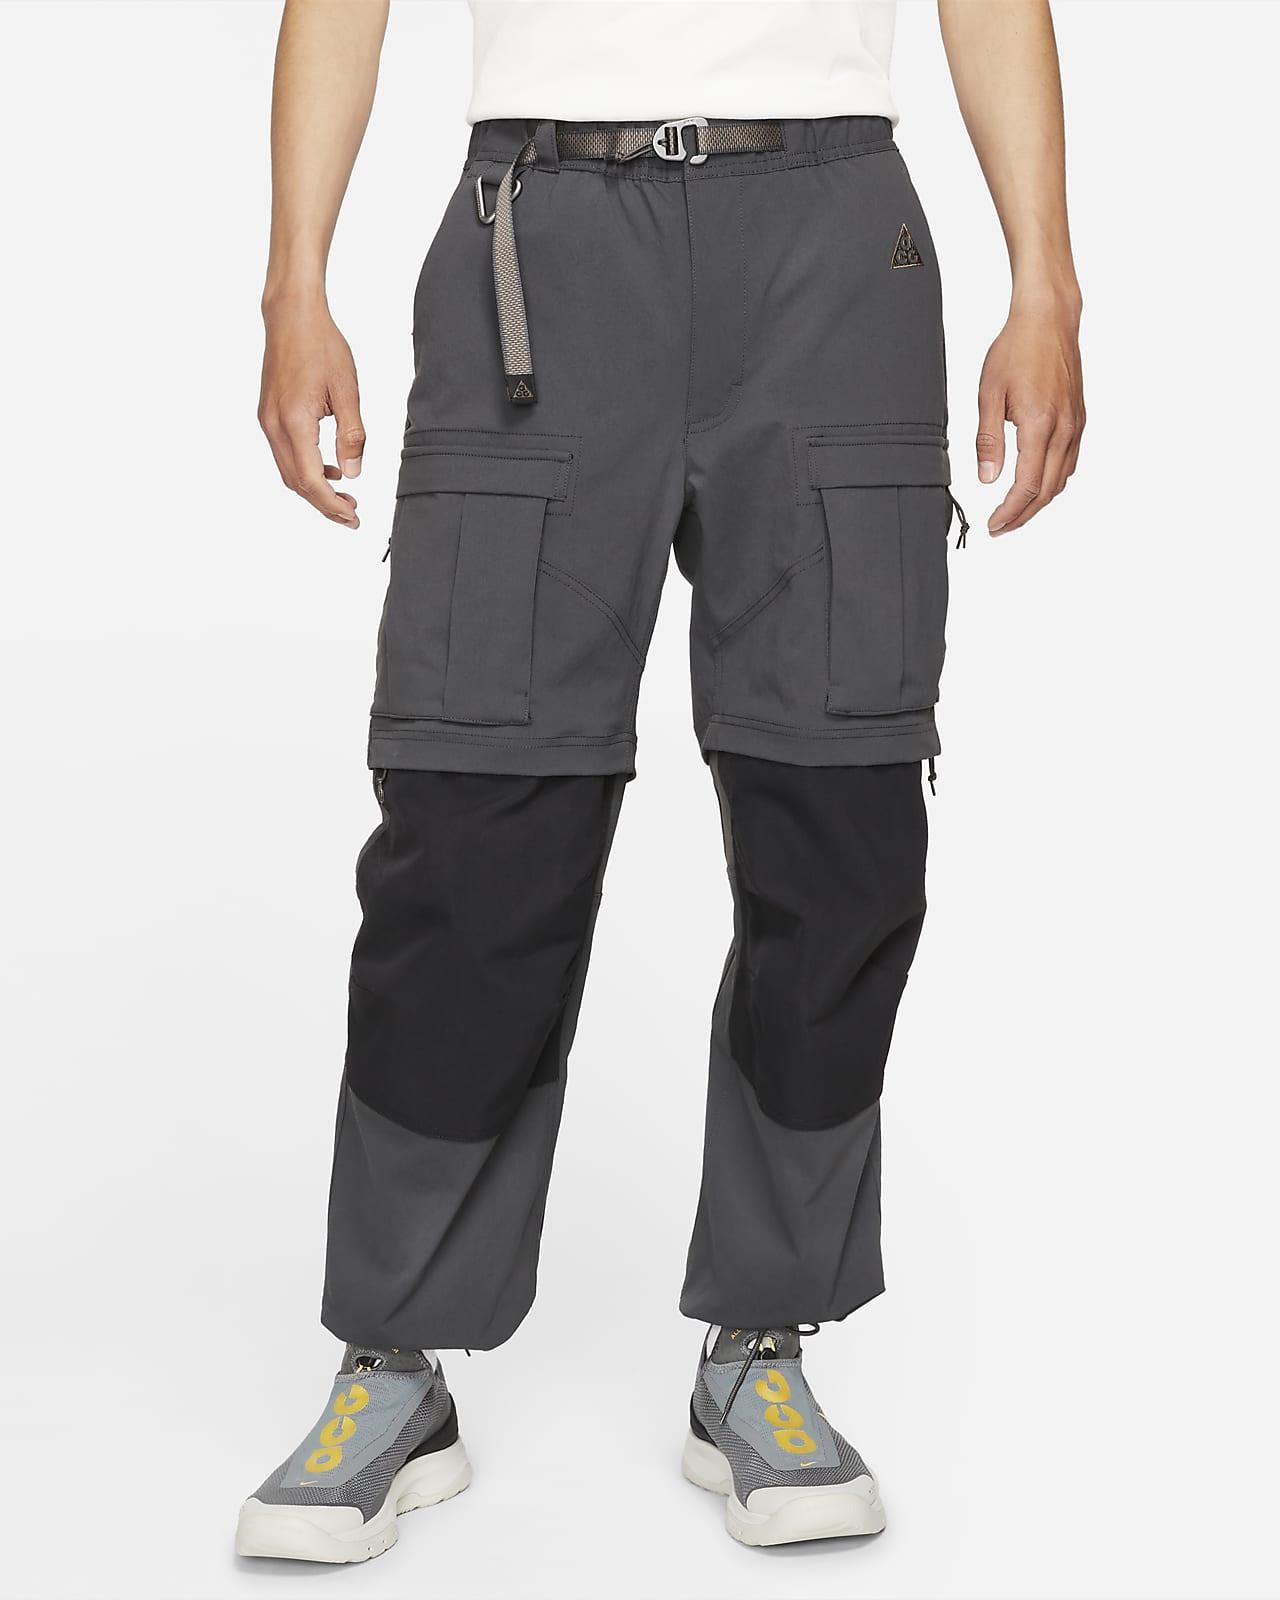 Nike ACG 'Smith Summit' Men's Cargo Trousers